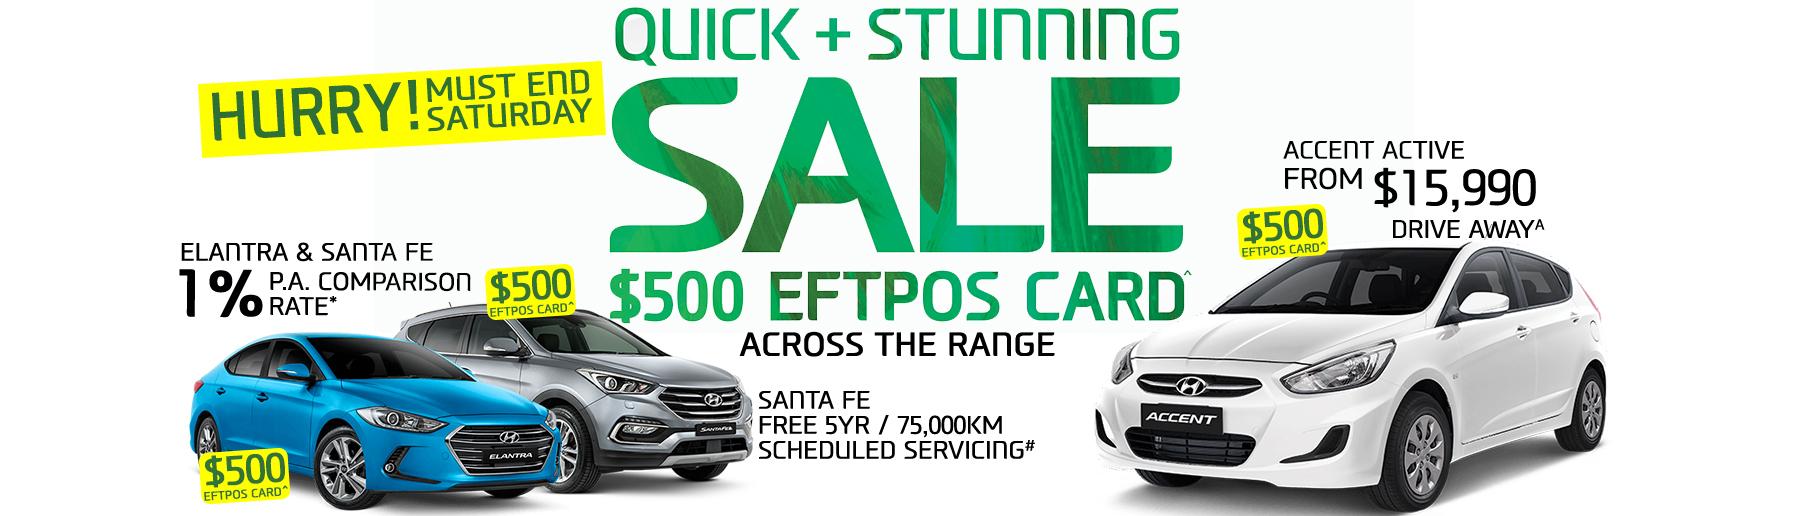 Yarra Hyundai 3 Day Sale